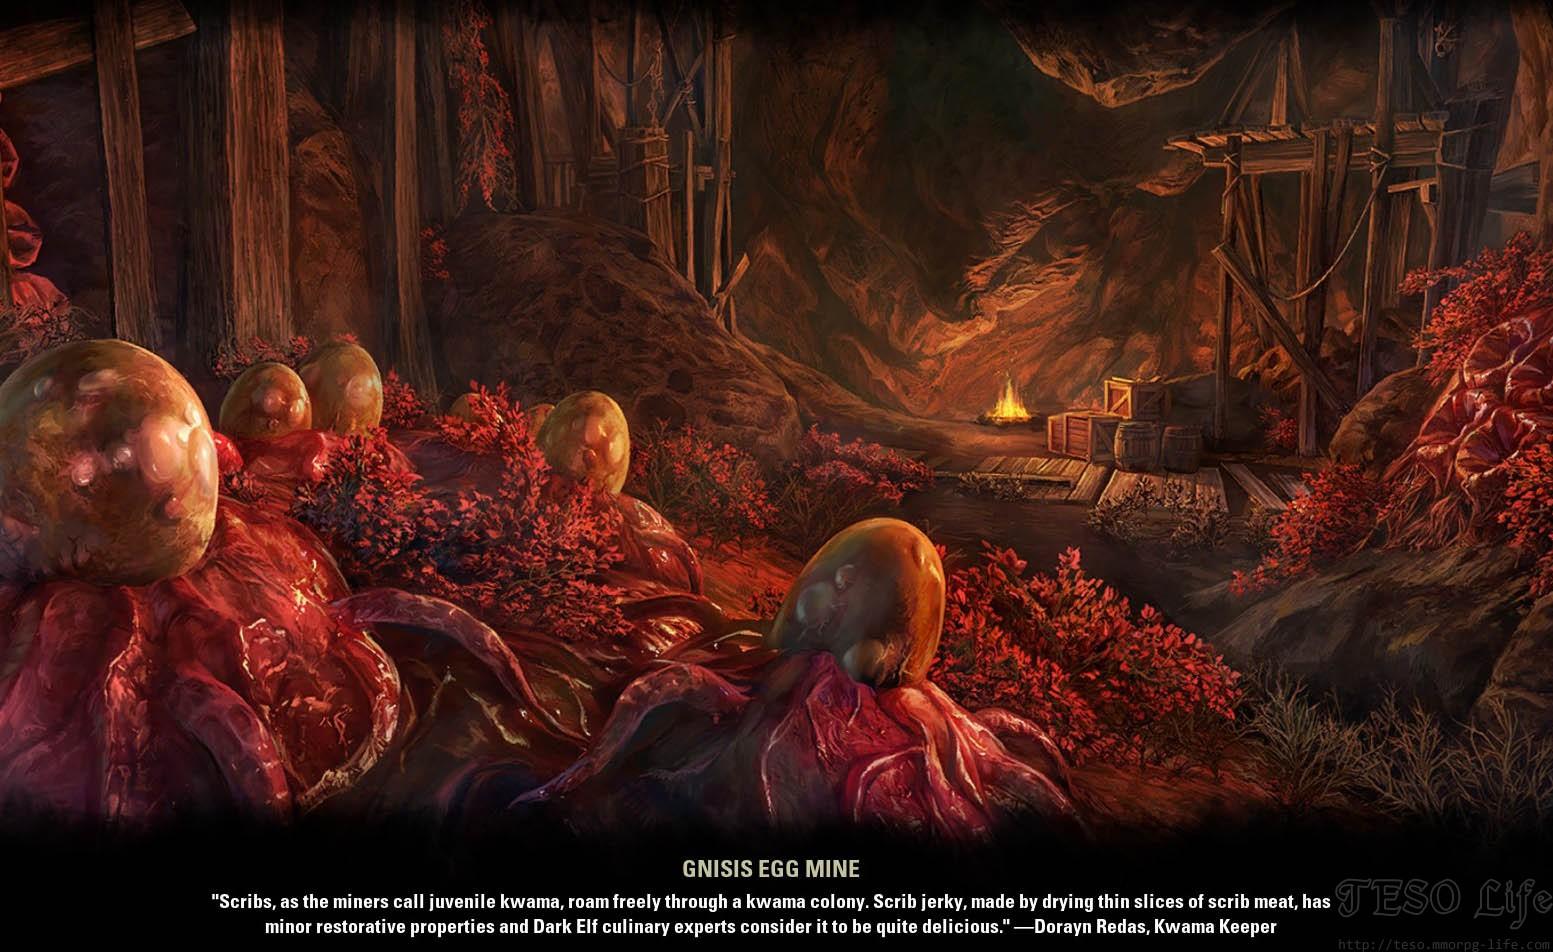 Gnisis Egg Mine ESO Morrowind